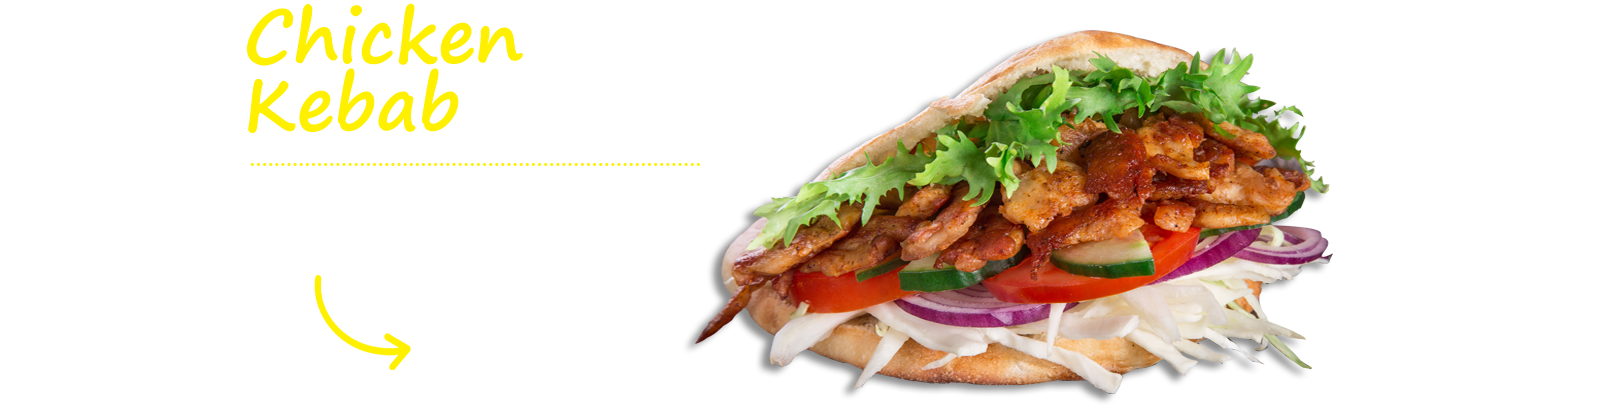 chicken-kebab.png